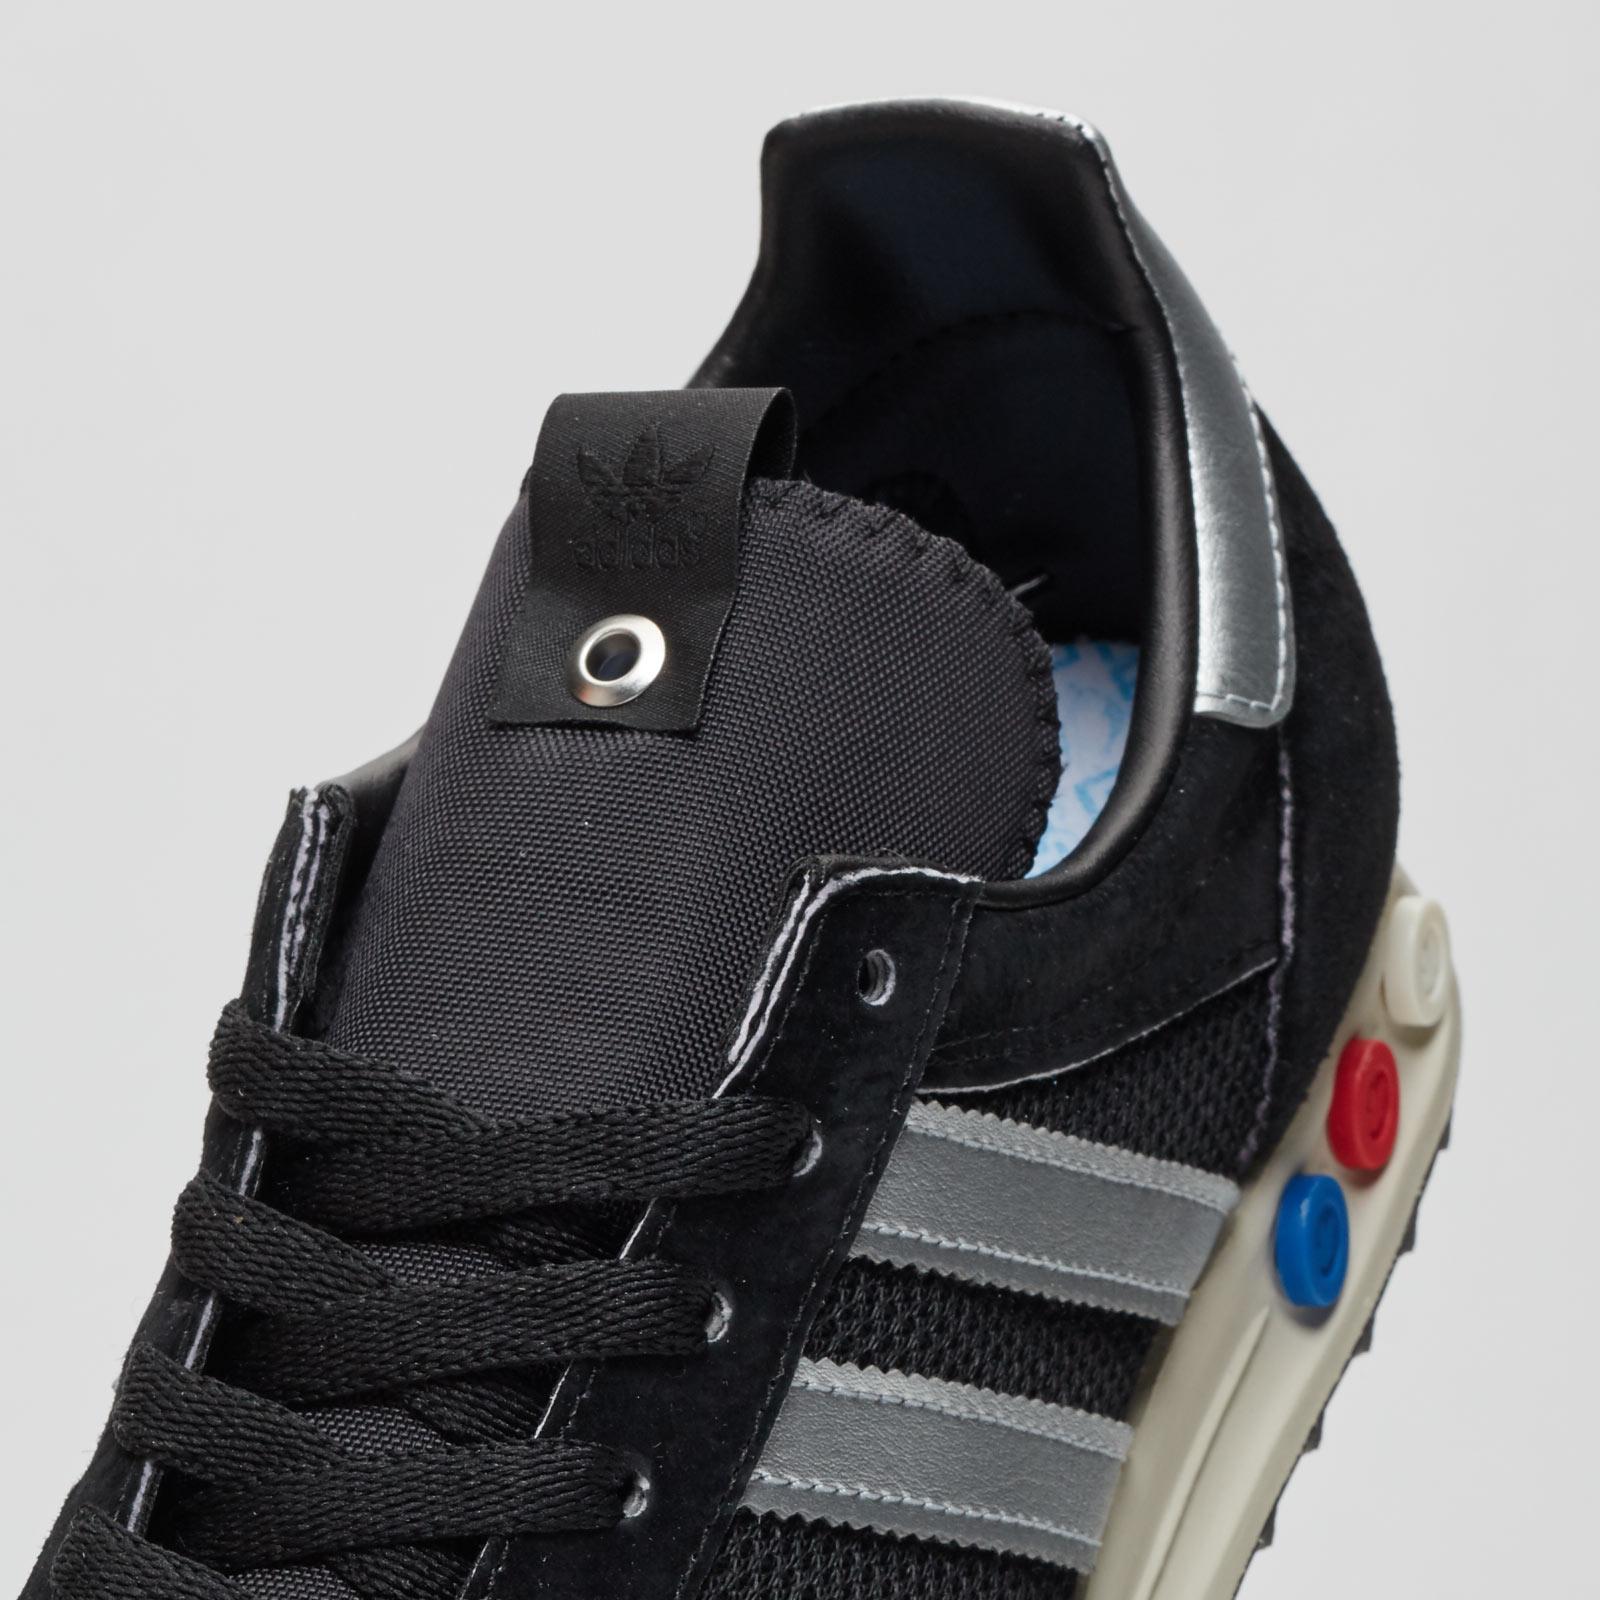 huge discount ad96f 91041 adidas LA Trainer OG MIG - Bb3774 - Sneakersnstuff   sneakers   streetwear  online since 1999